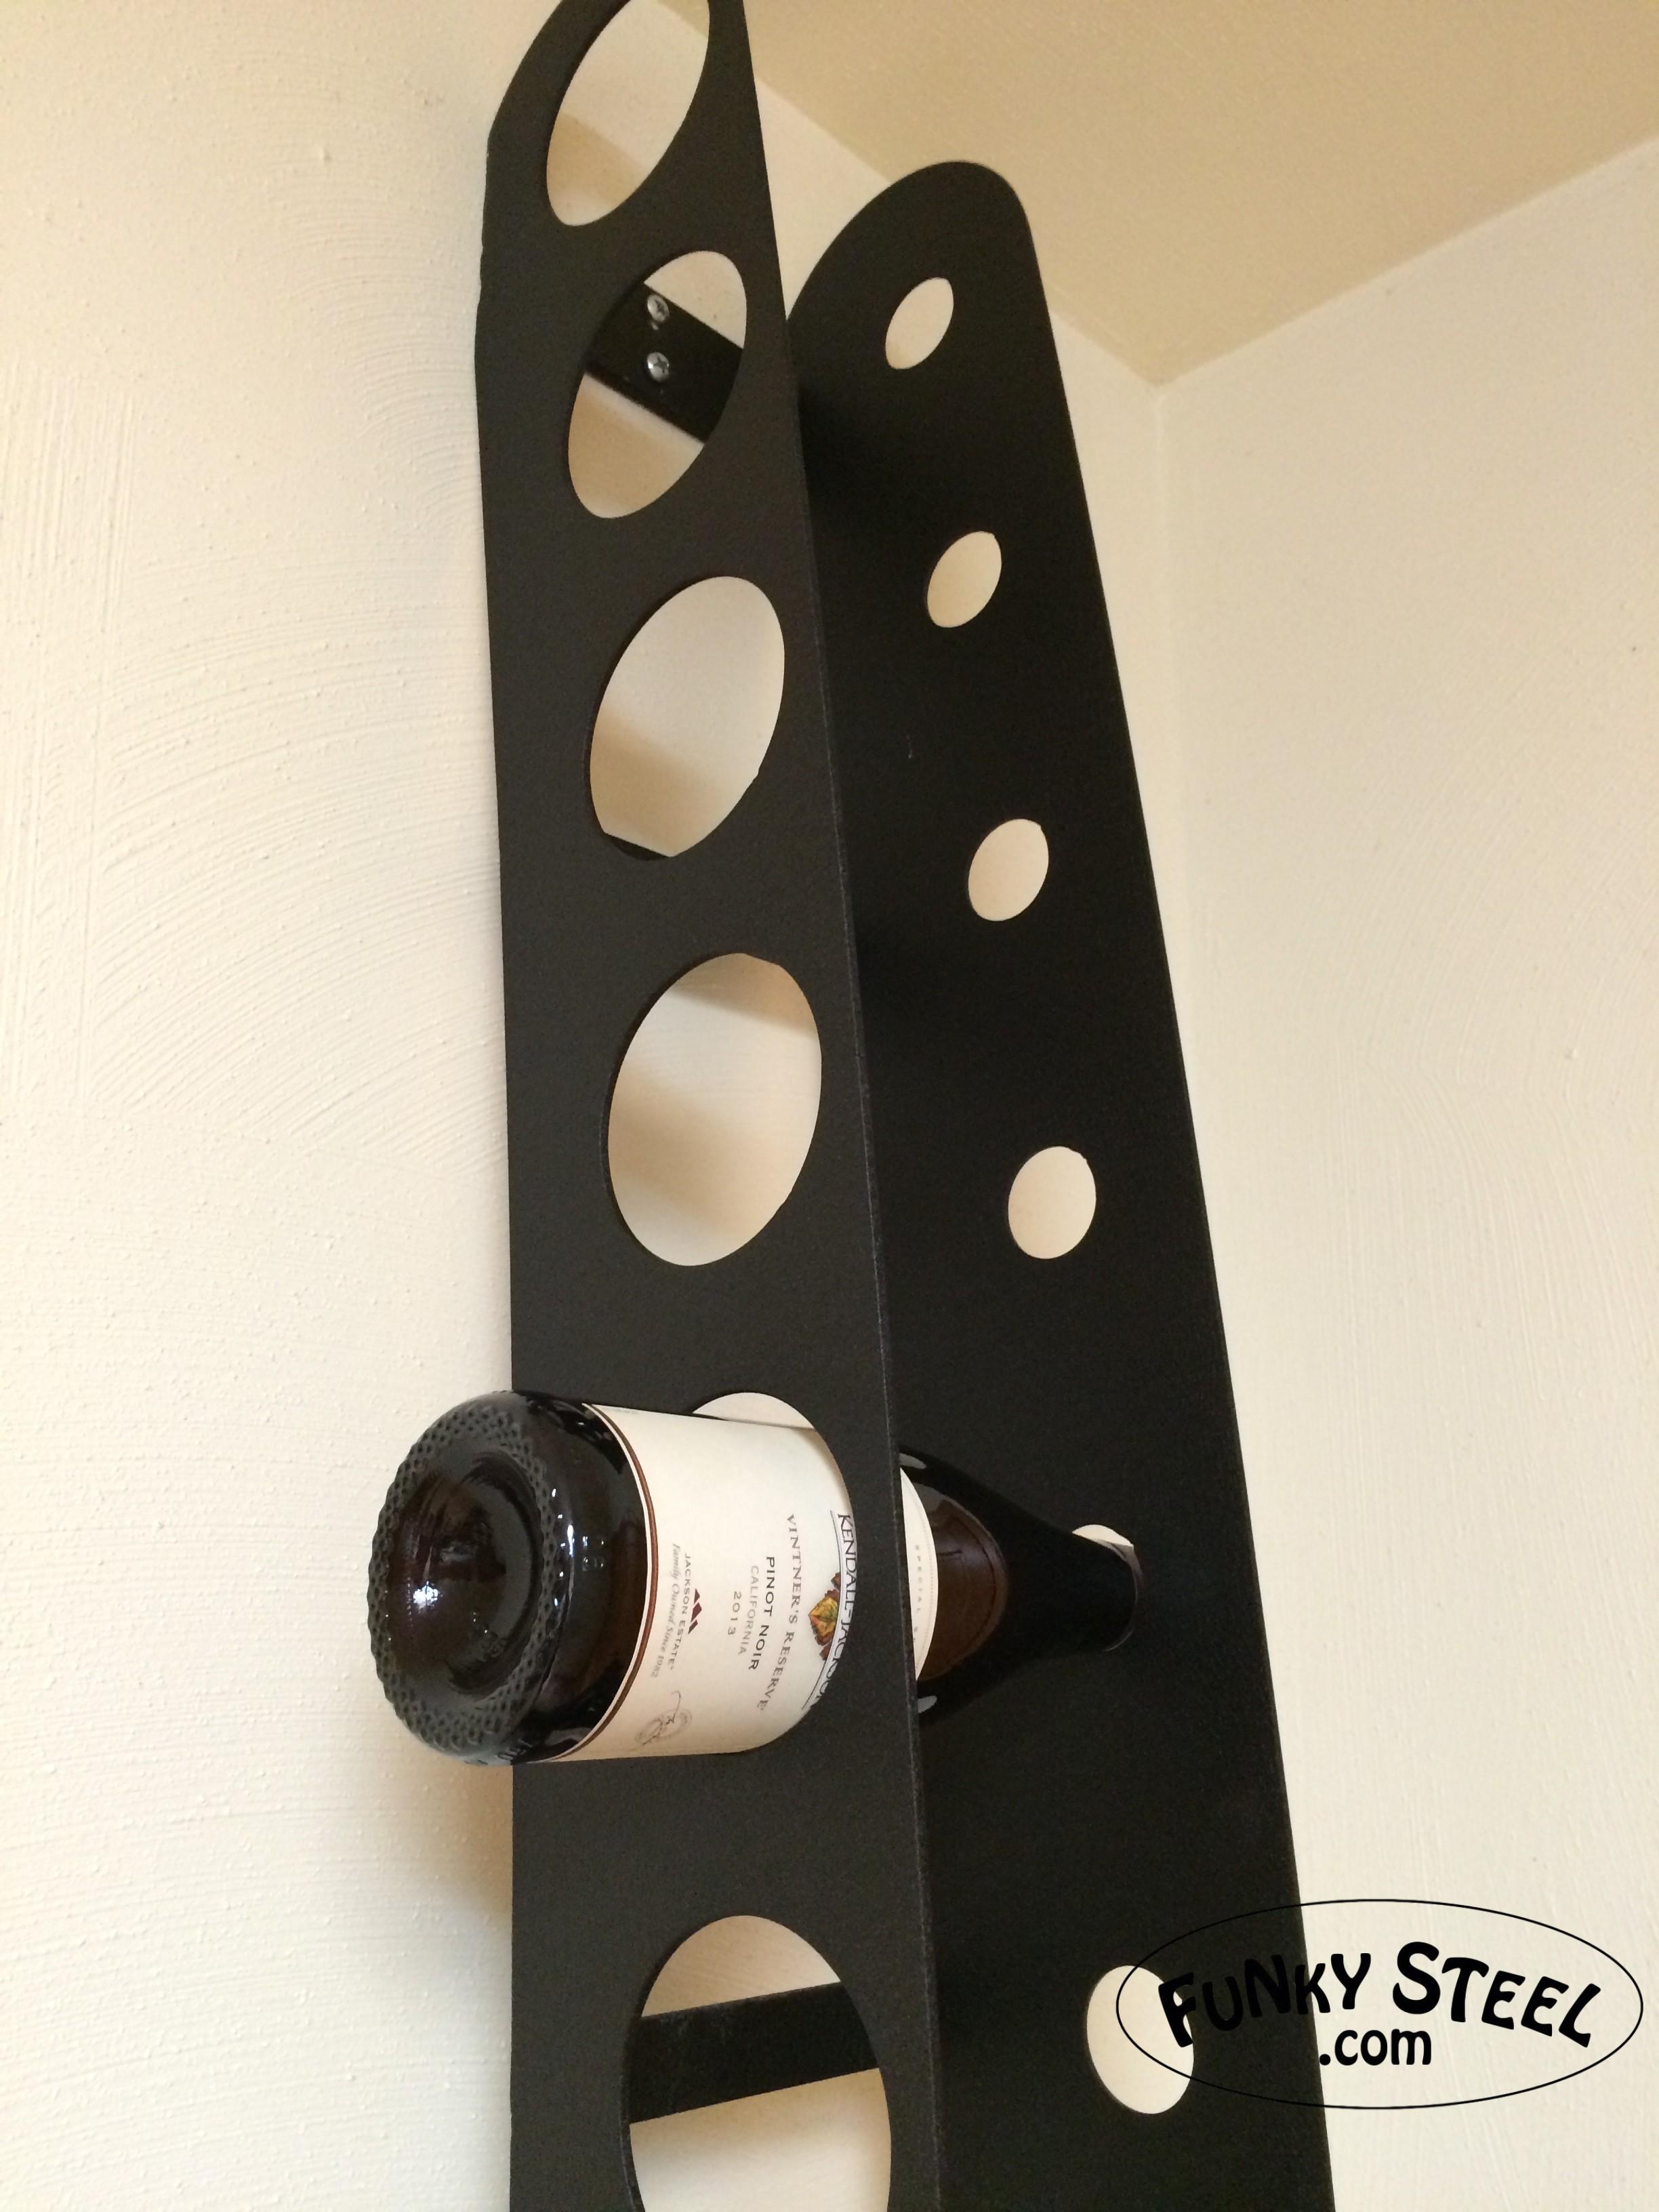 Wine Racks Wall Mounted Modern Innovative Design By